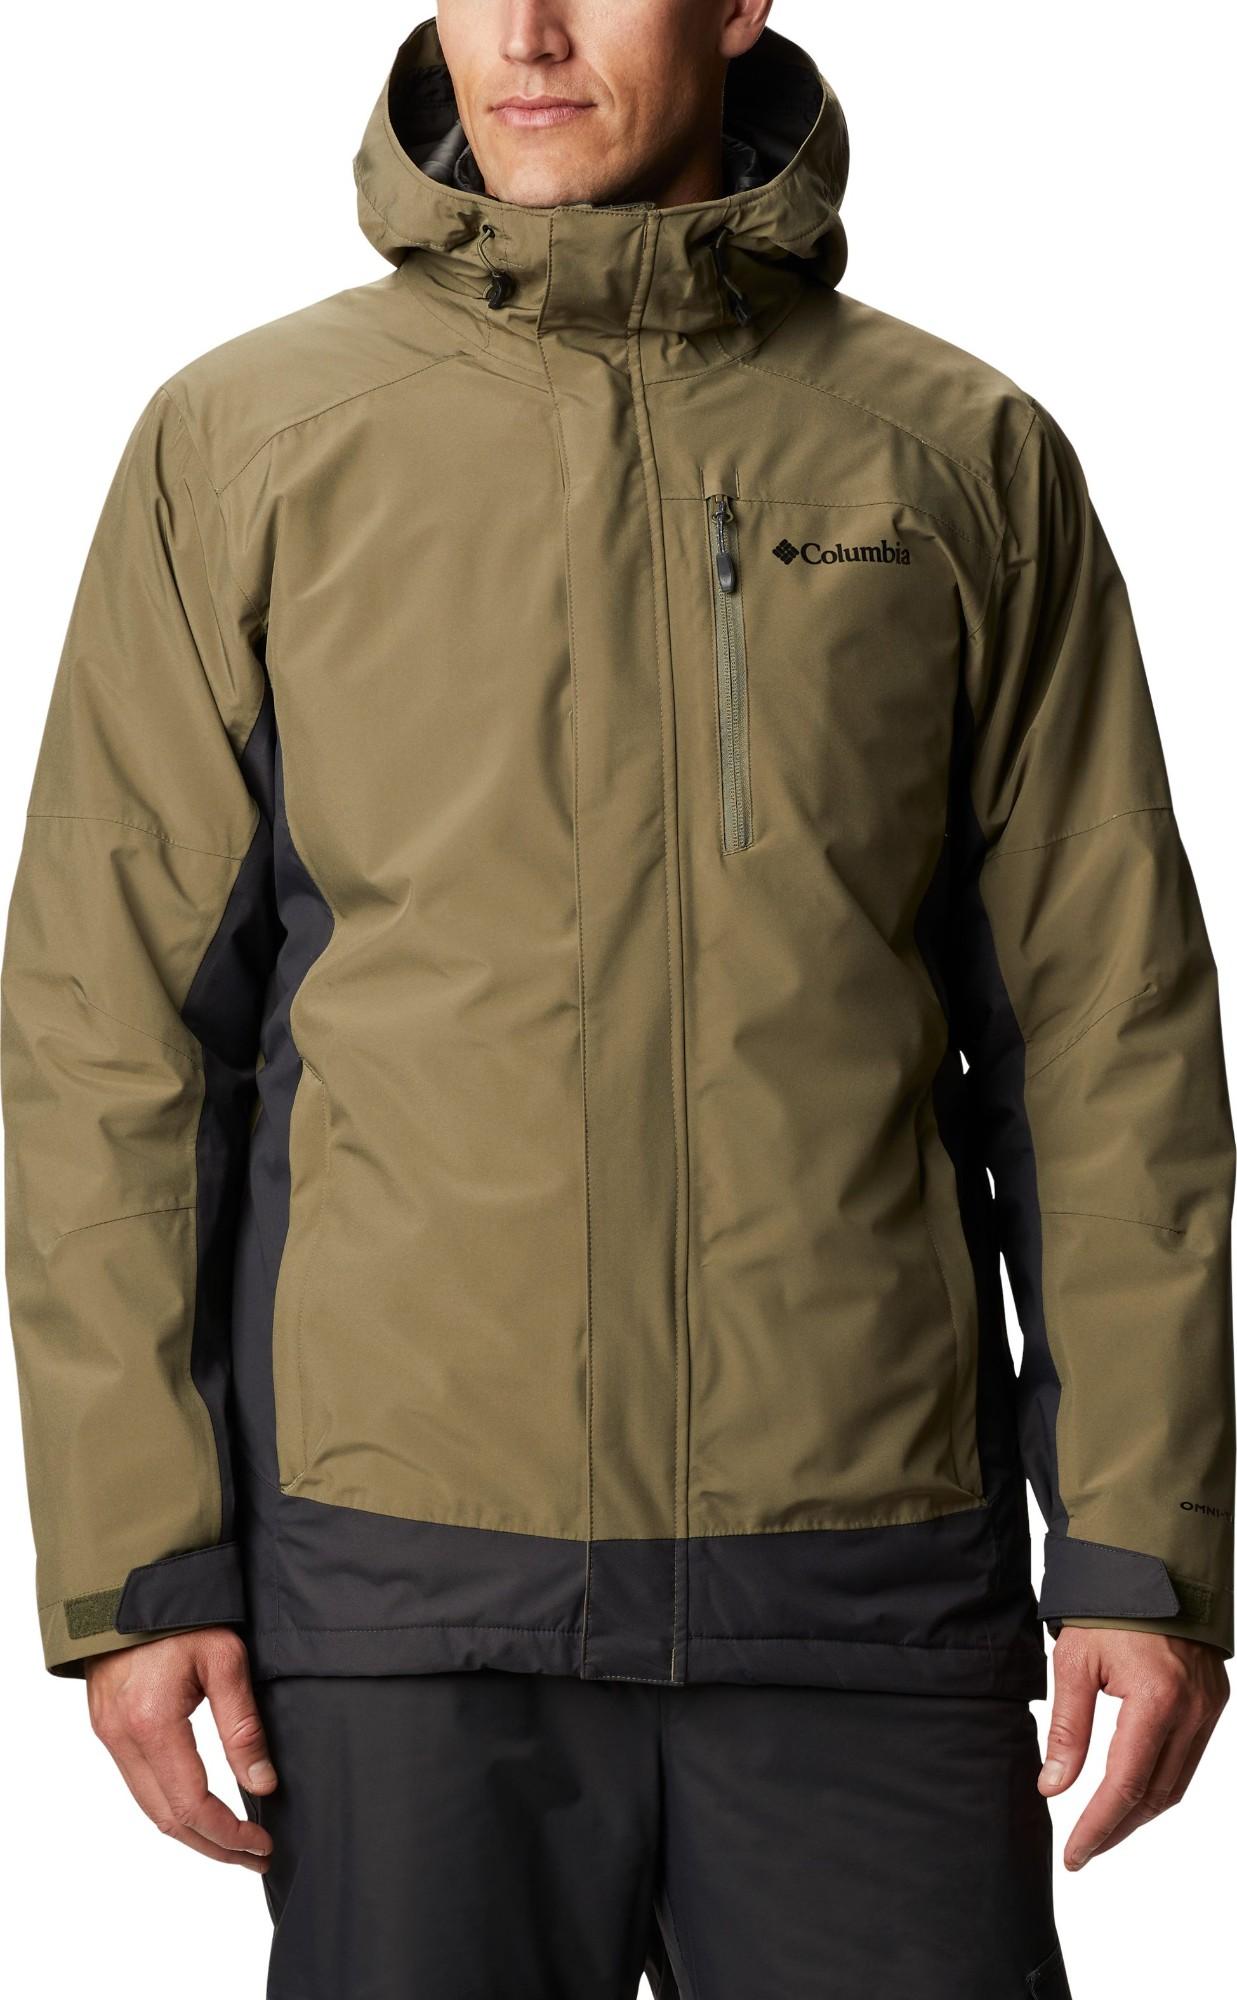 Columbia Lhotse III Interchange Jacket Men's Stone Green/Shark XL